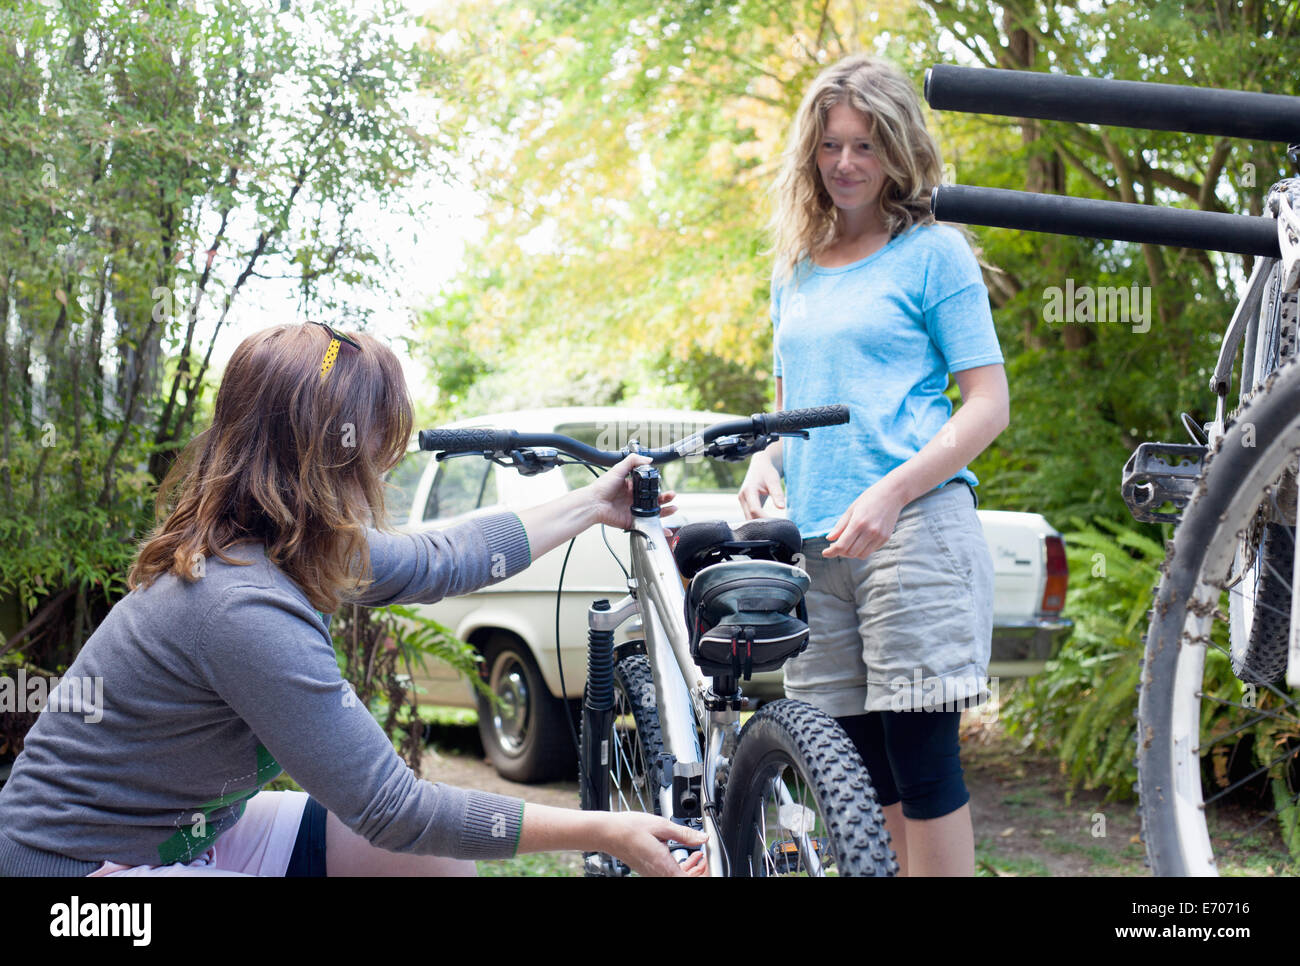 Zwei Frauen Mountainbiker Check-Zyklen in Wald Stockbild